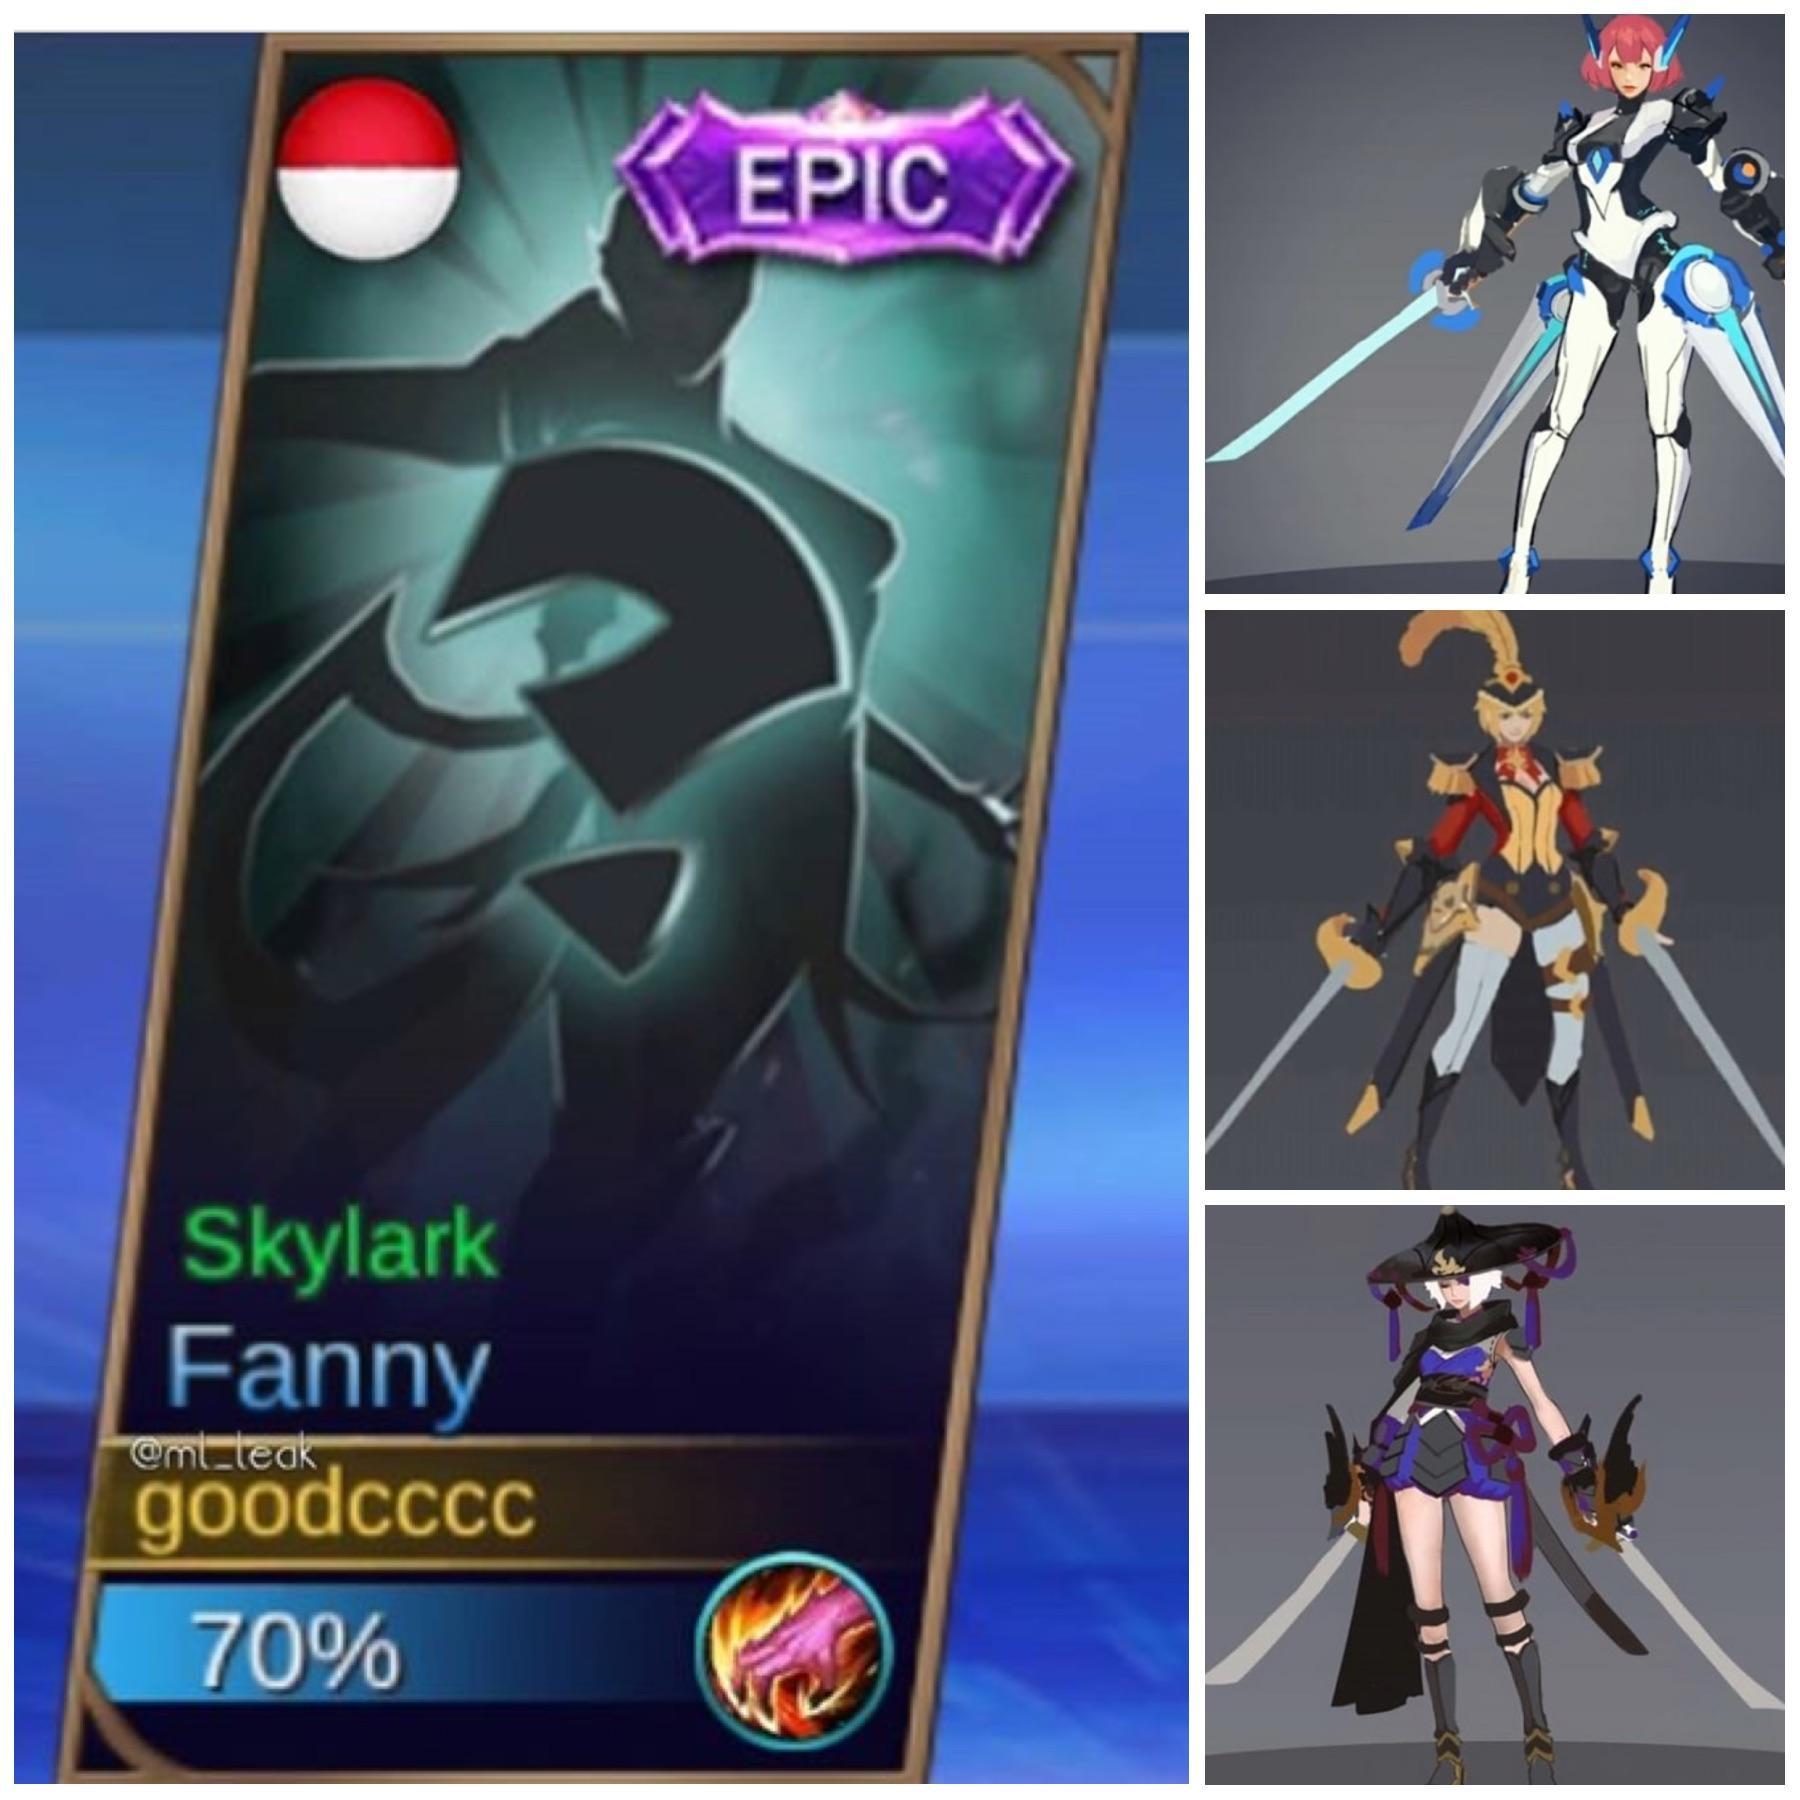 Fanny   Skylark mobilelegends 1800x1800